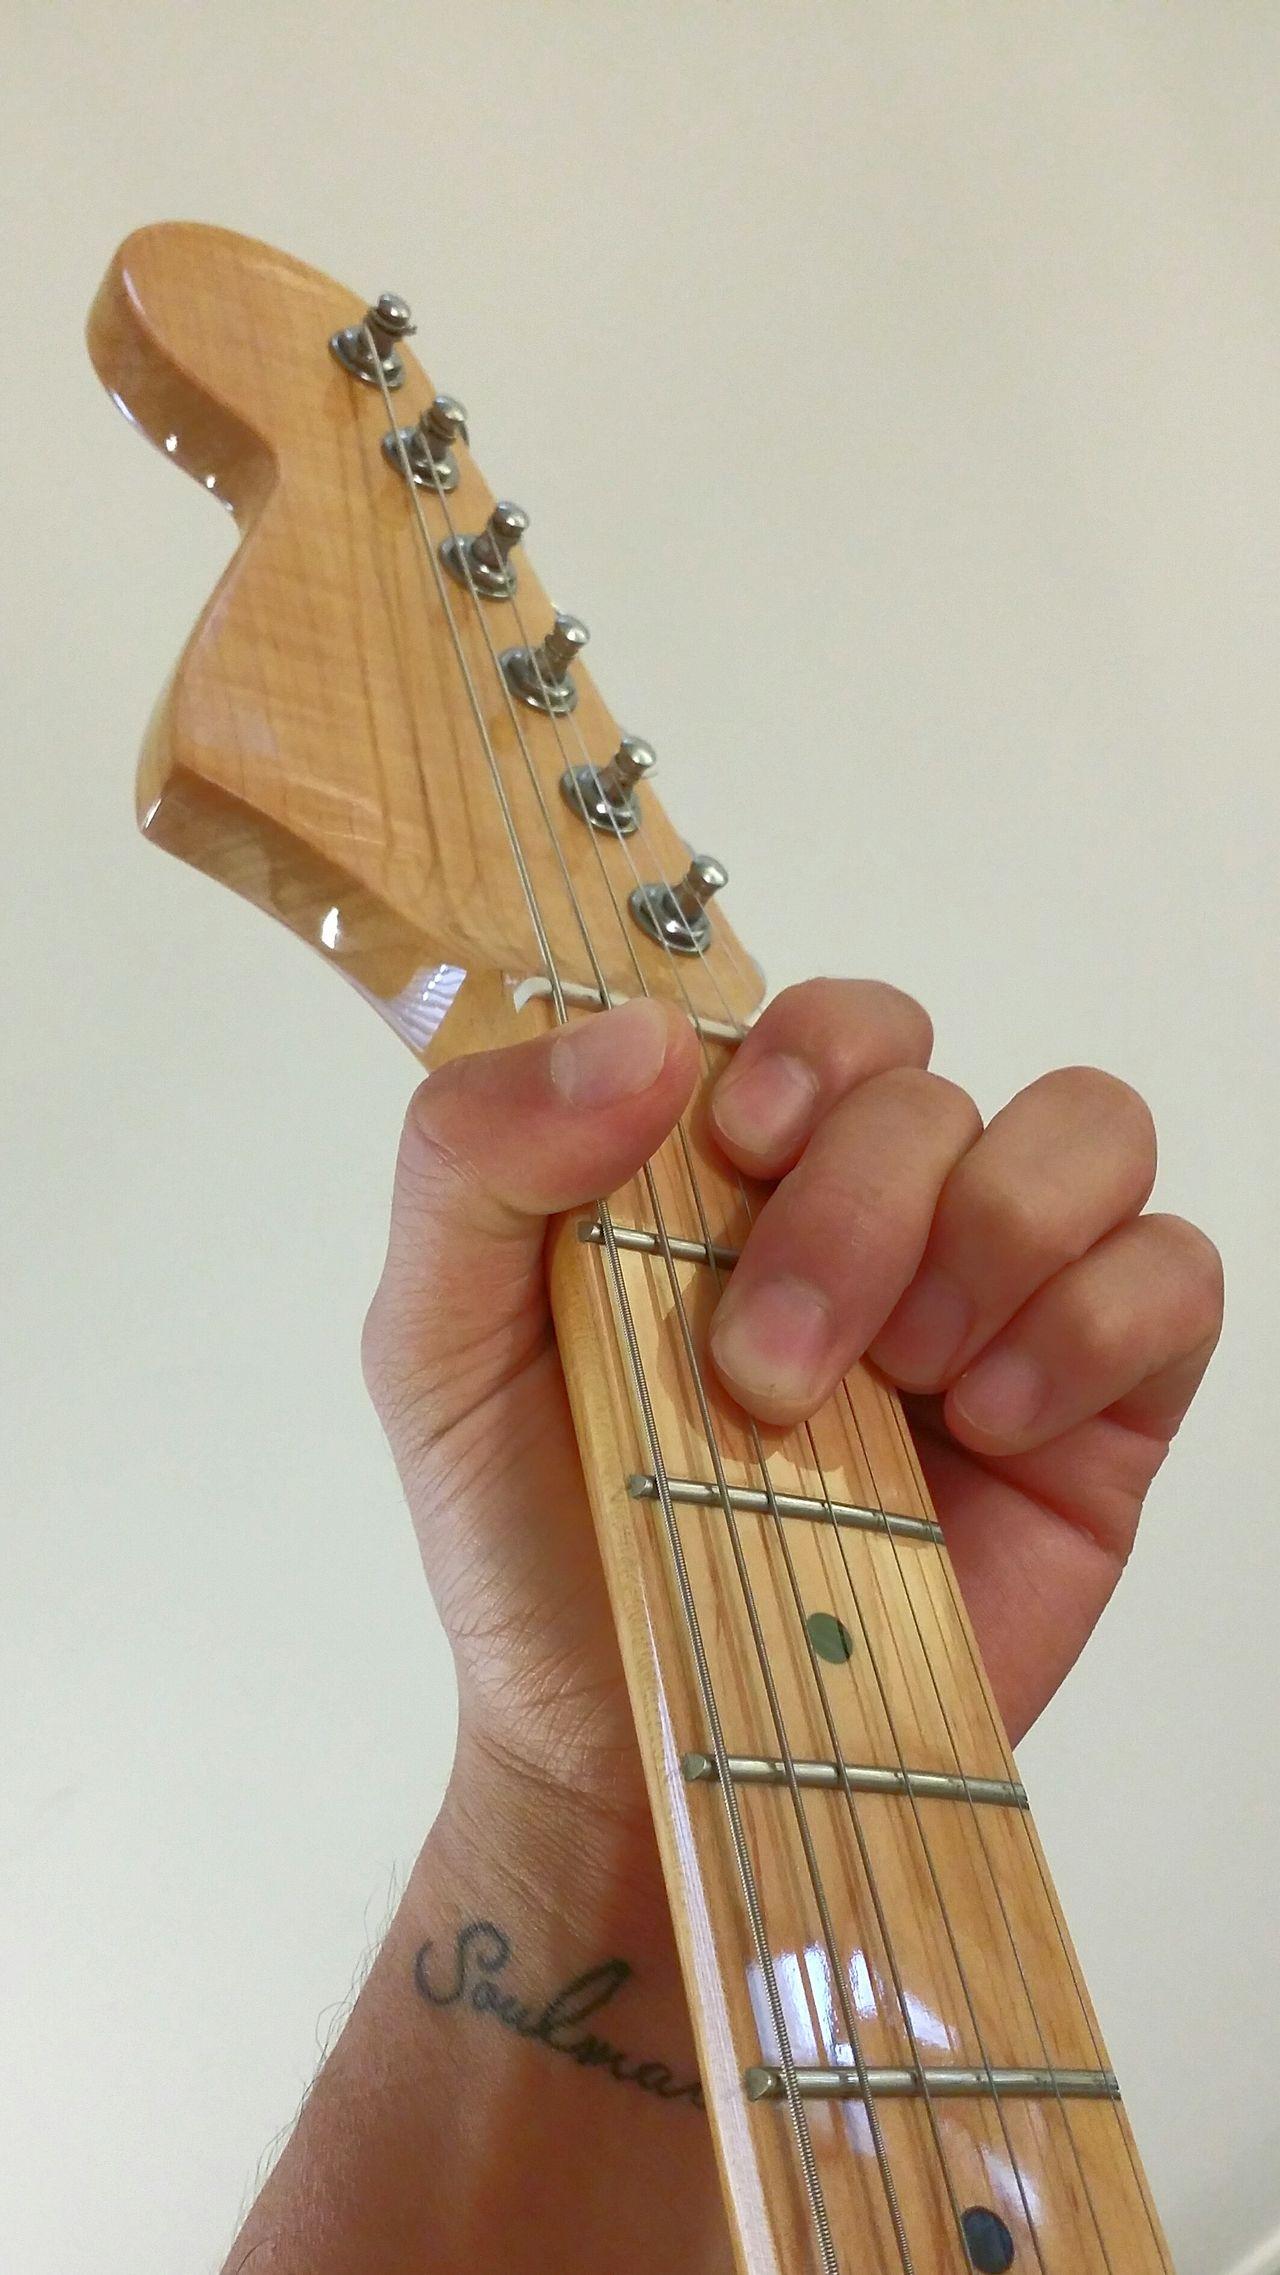 Guitar Guitar Neck Maple Neck Guitar Chord Music Musician Rocker Rockout Rock'n'Roll Rockabilly Guitar Playing Musical Instrument 기타 기타연주 로커 기타코드 뮤지션 음악인 일렉기타